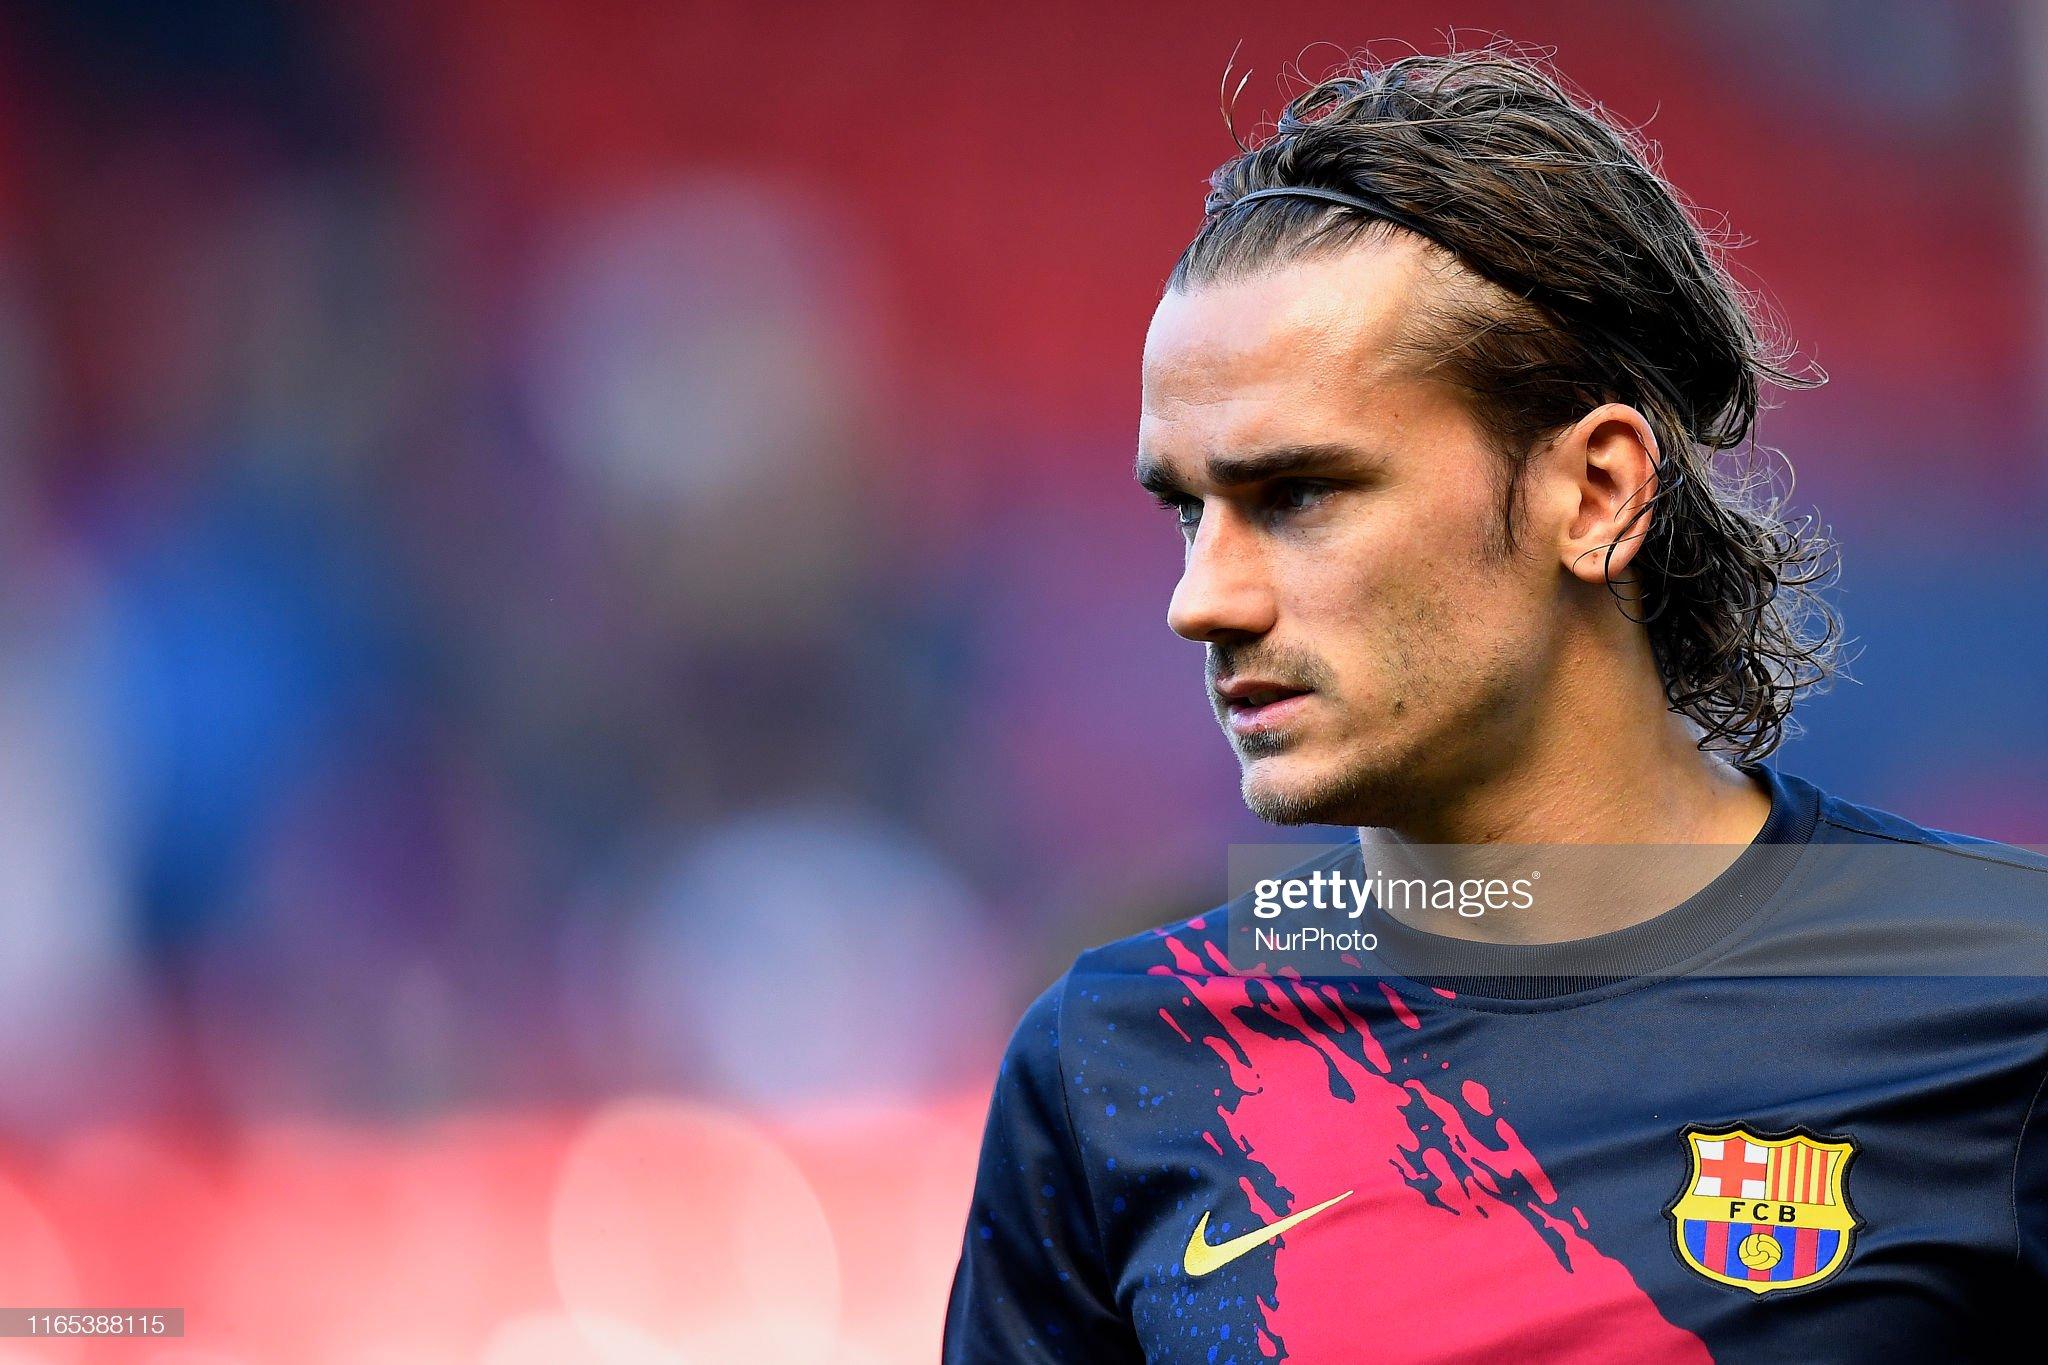 صور مباراة : أوساسونا - برشلونة 2-2 ( 31-08-2019 )  Antoine-griezmann-of-barcelona-during-the-warmup-before-the-liga-ca-picture-id1165388115?s=2048x2048